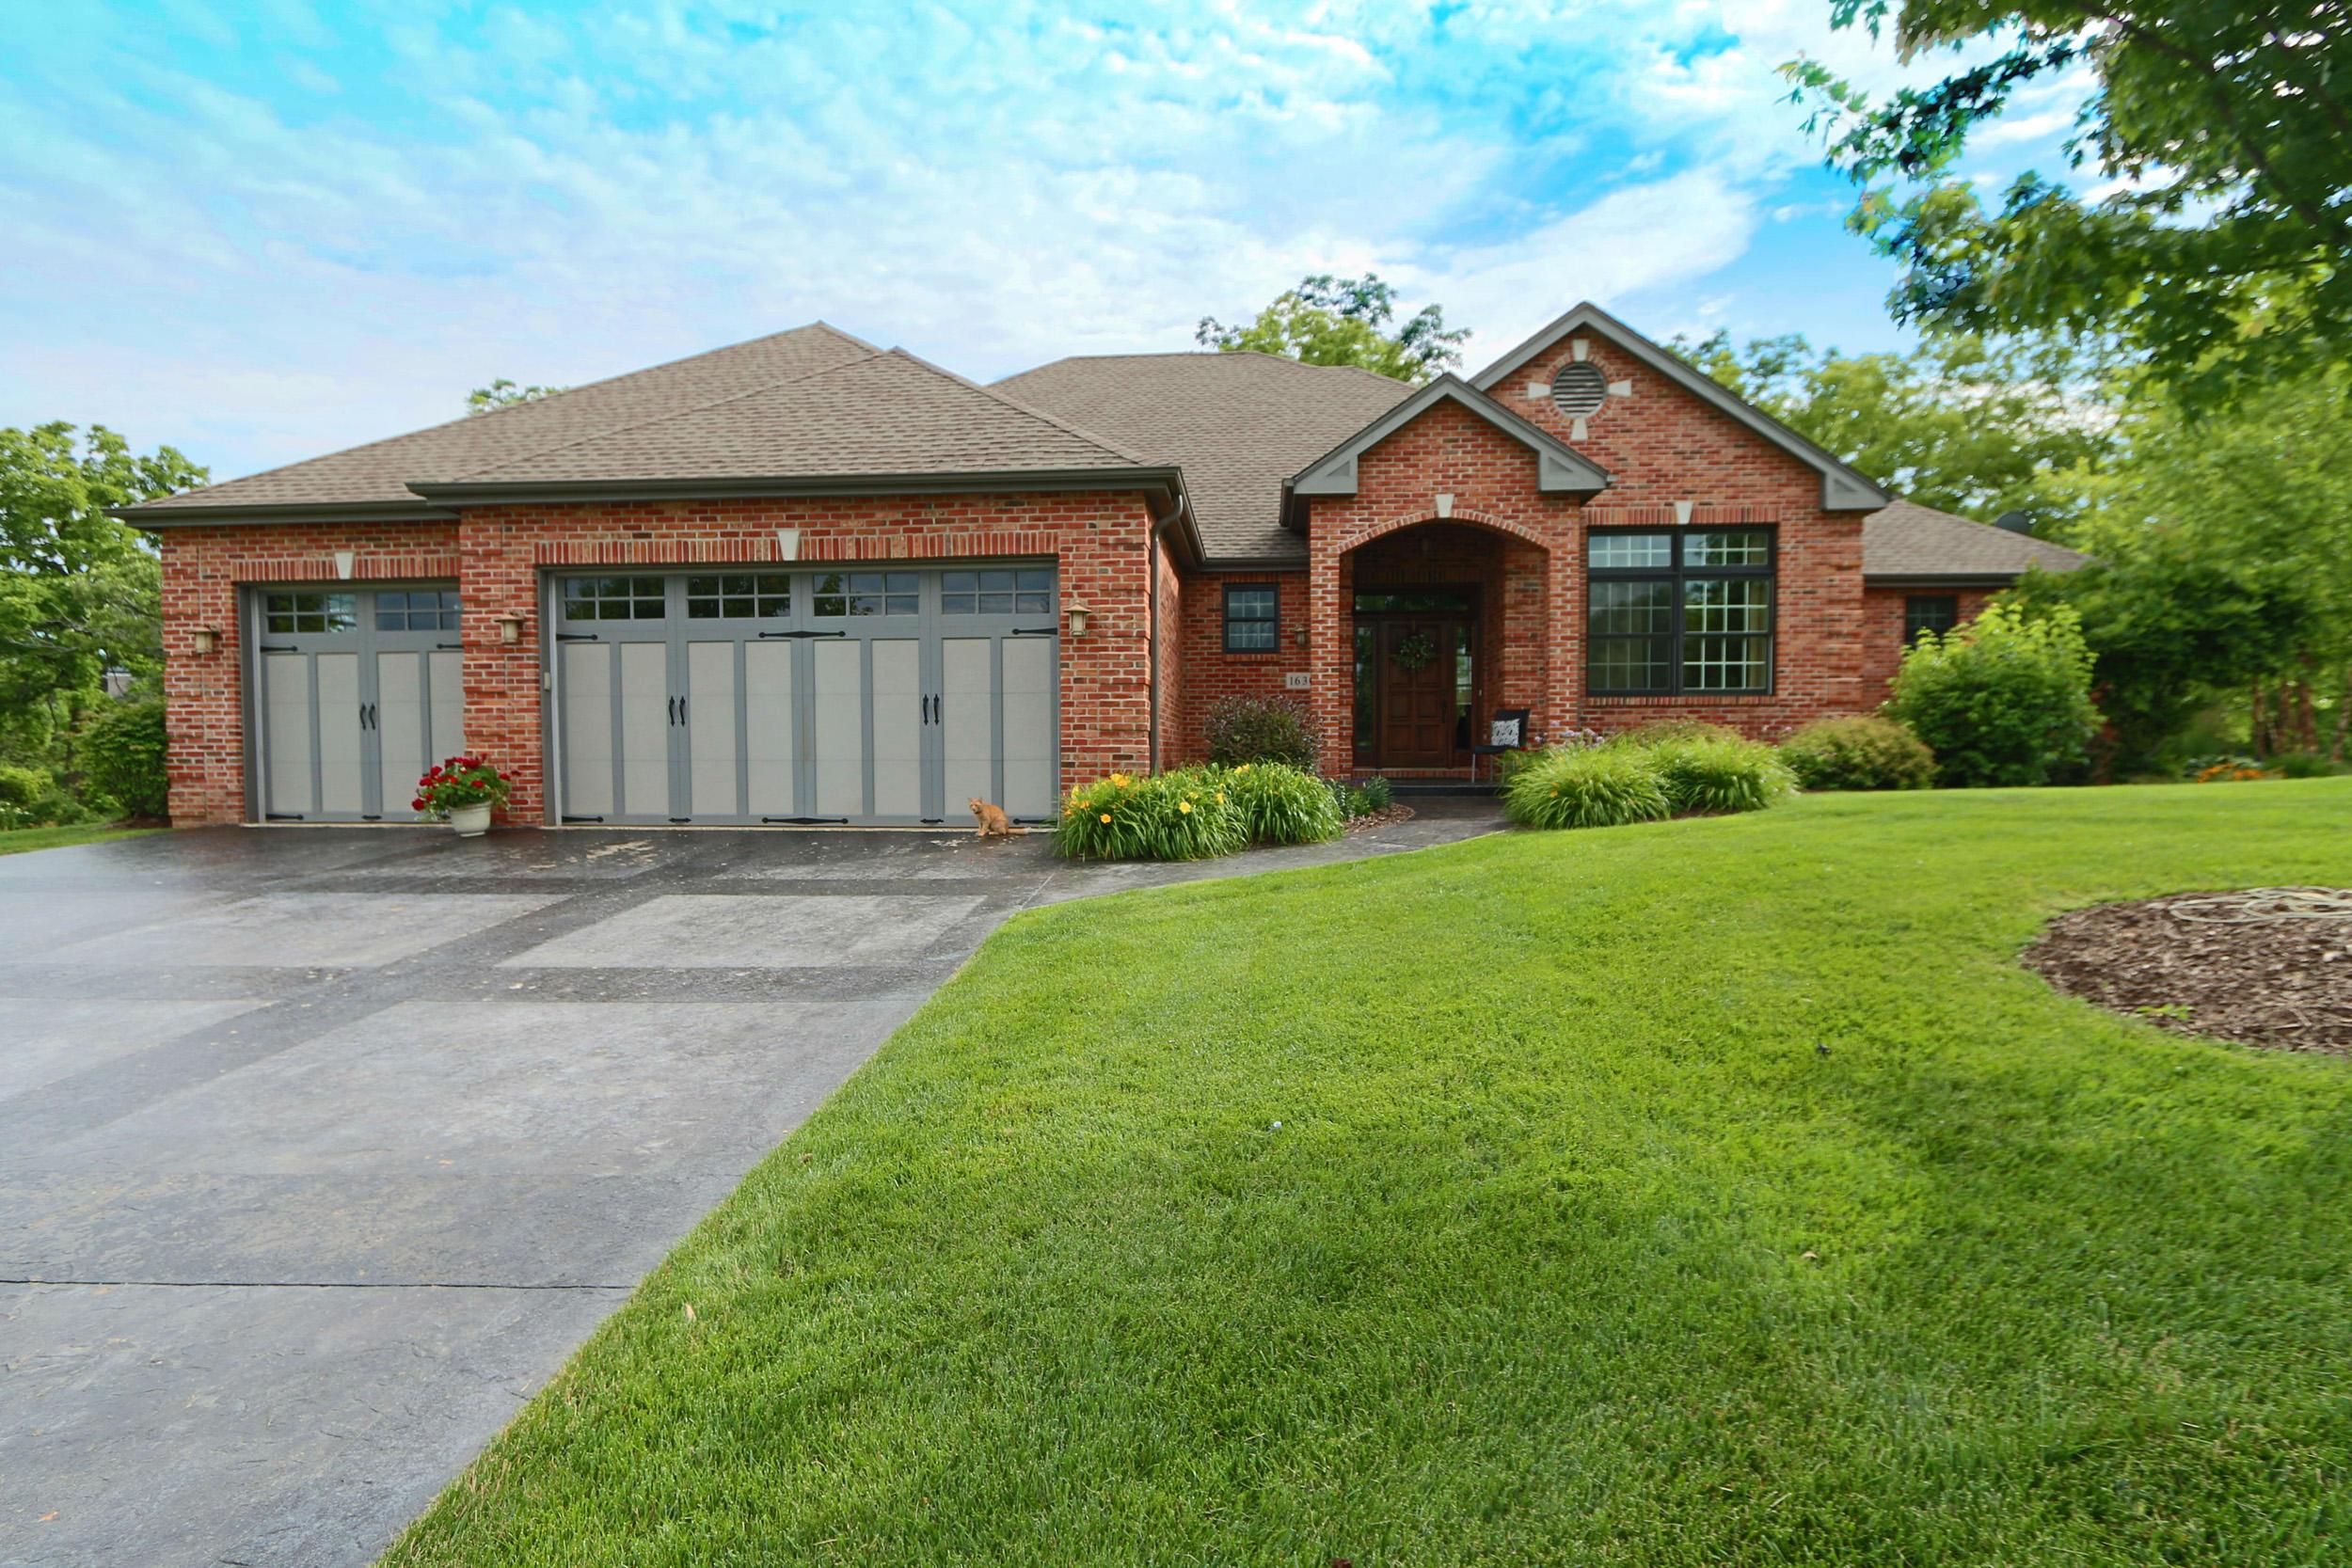 1630 Woodhall Way, Geneva, Wisconsin 53147, 5 Bedrooms Bedrooms, ,3 BathroomsBathrooms,Condominiums,For Sale,Woodhall Way,1,1676860